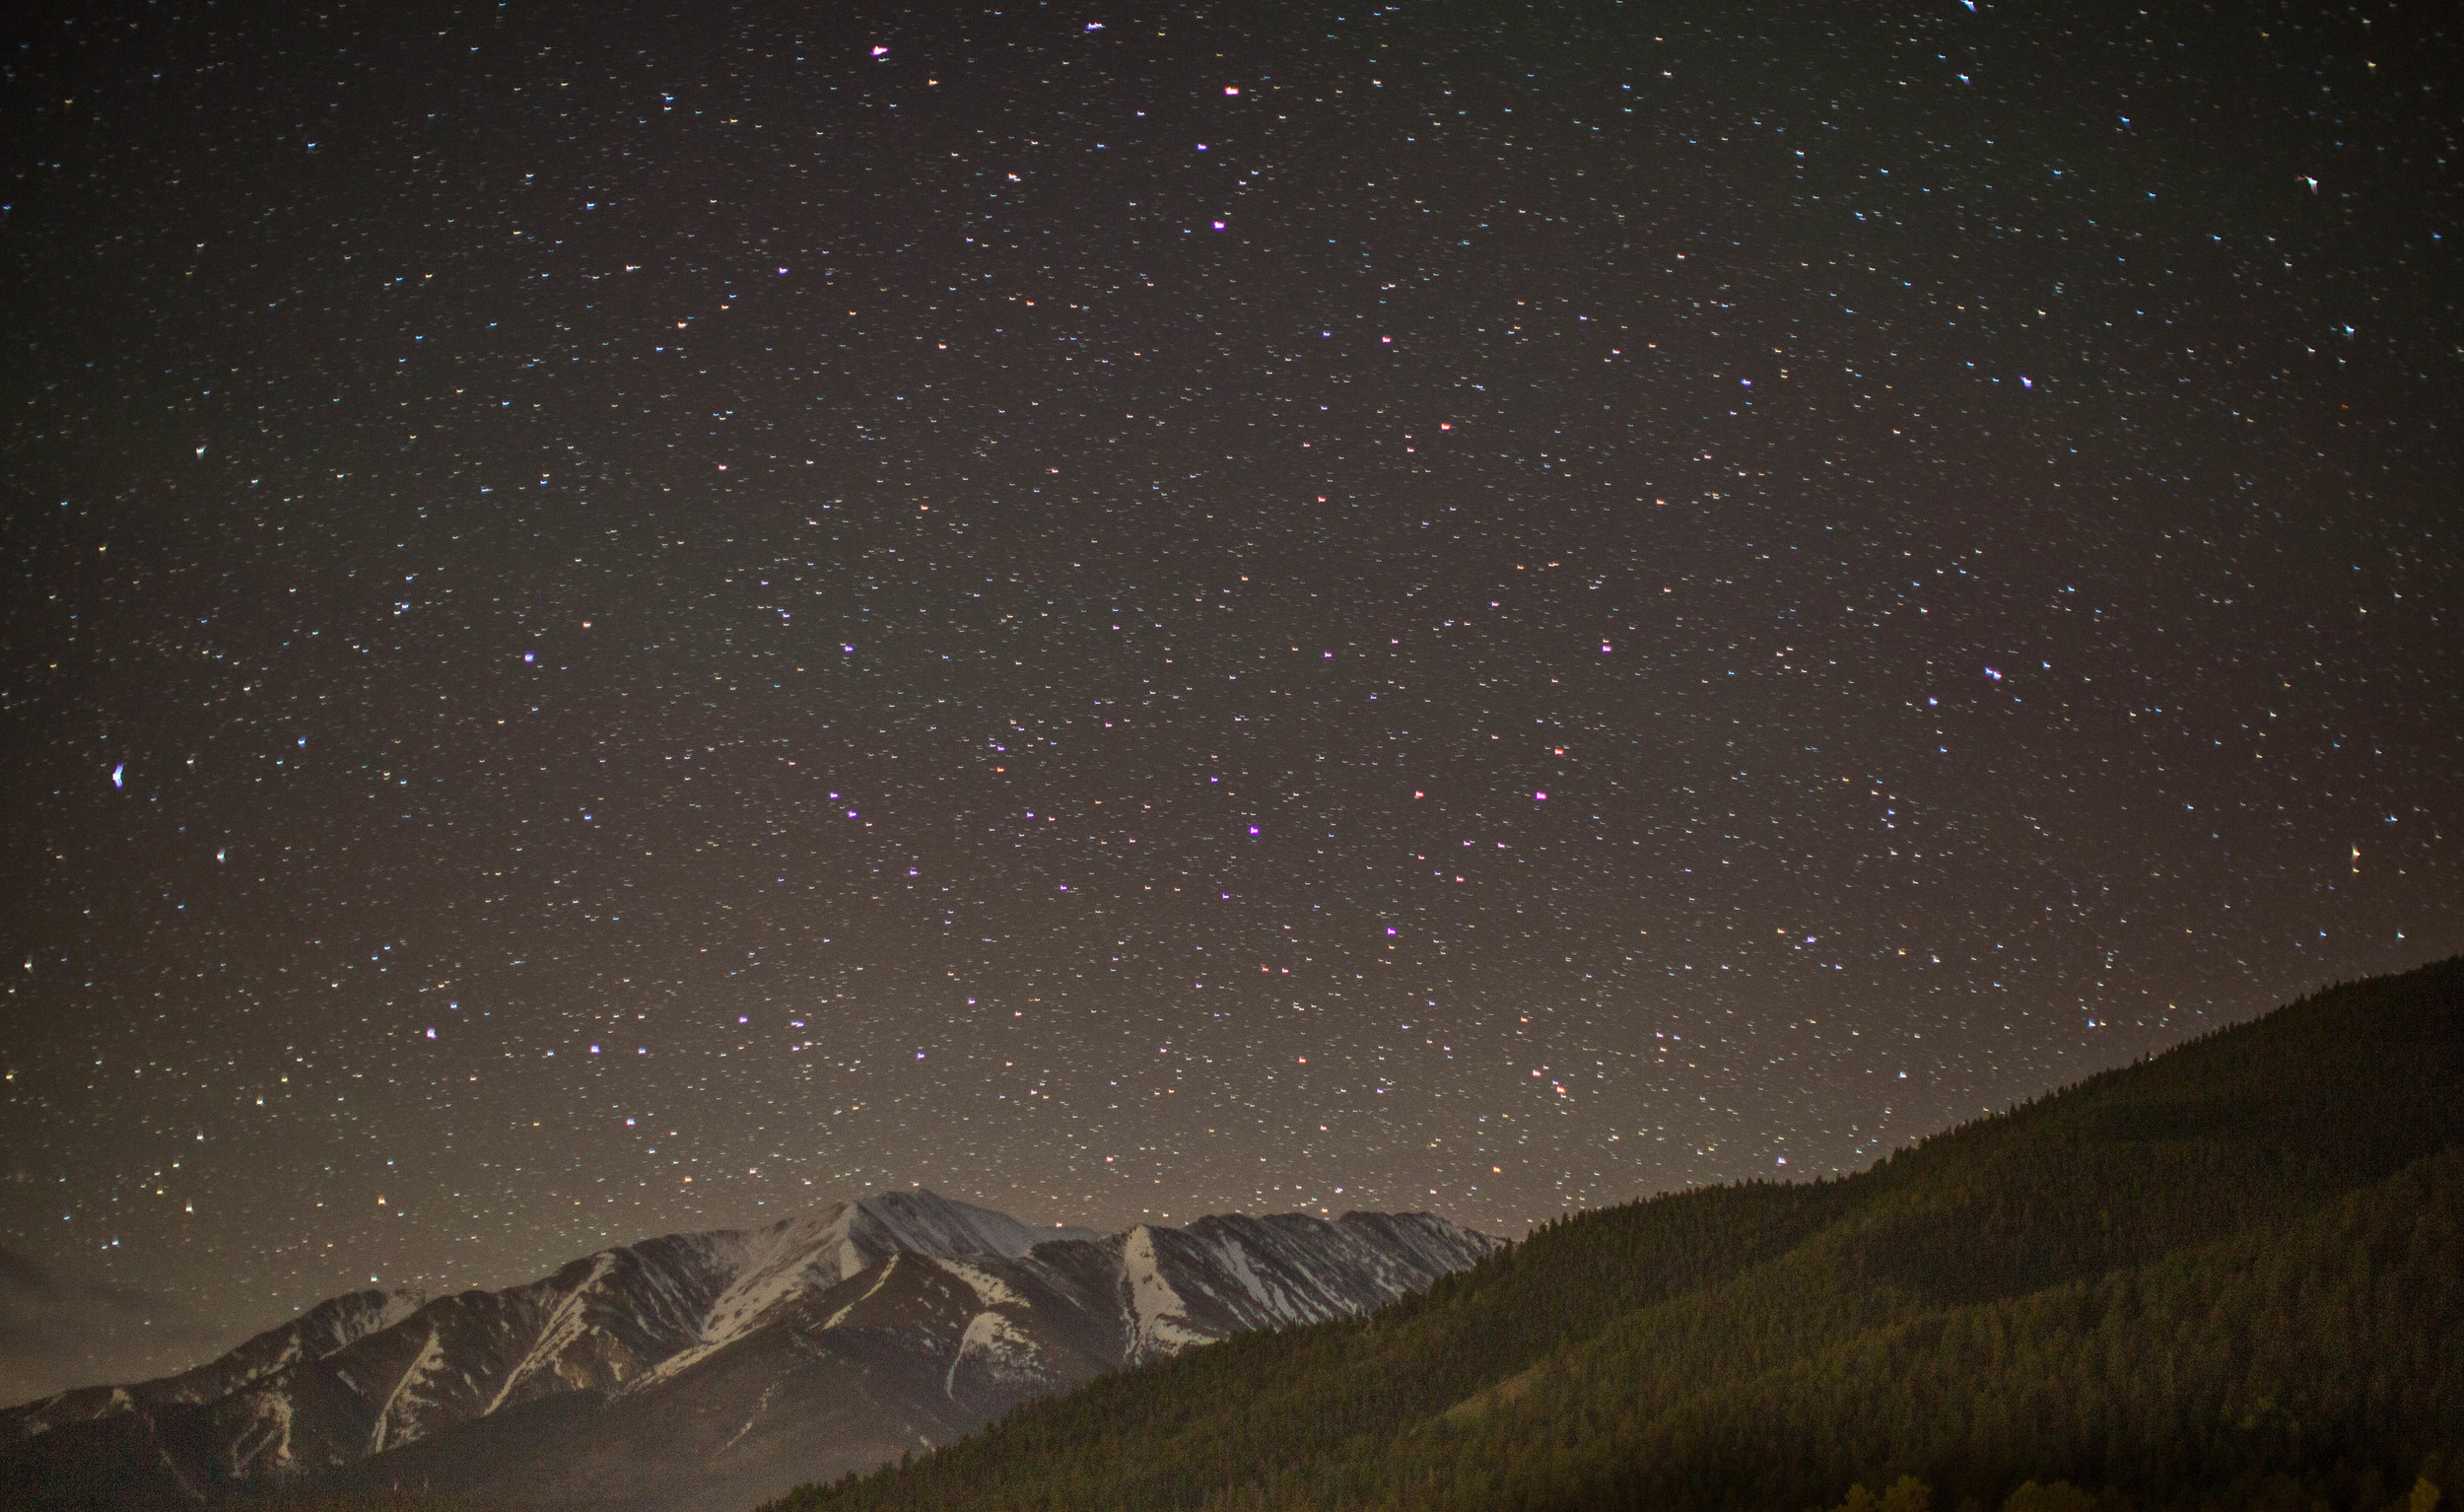 trail-west-starry-night